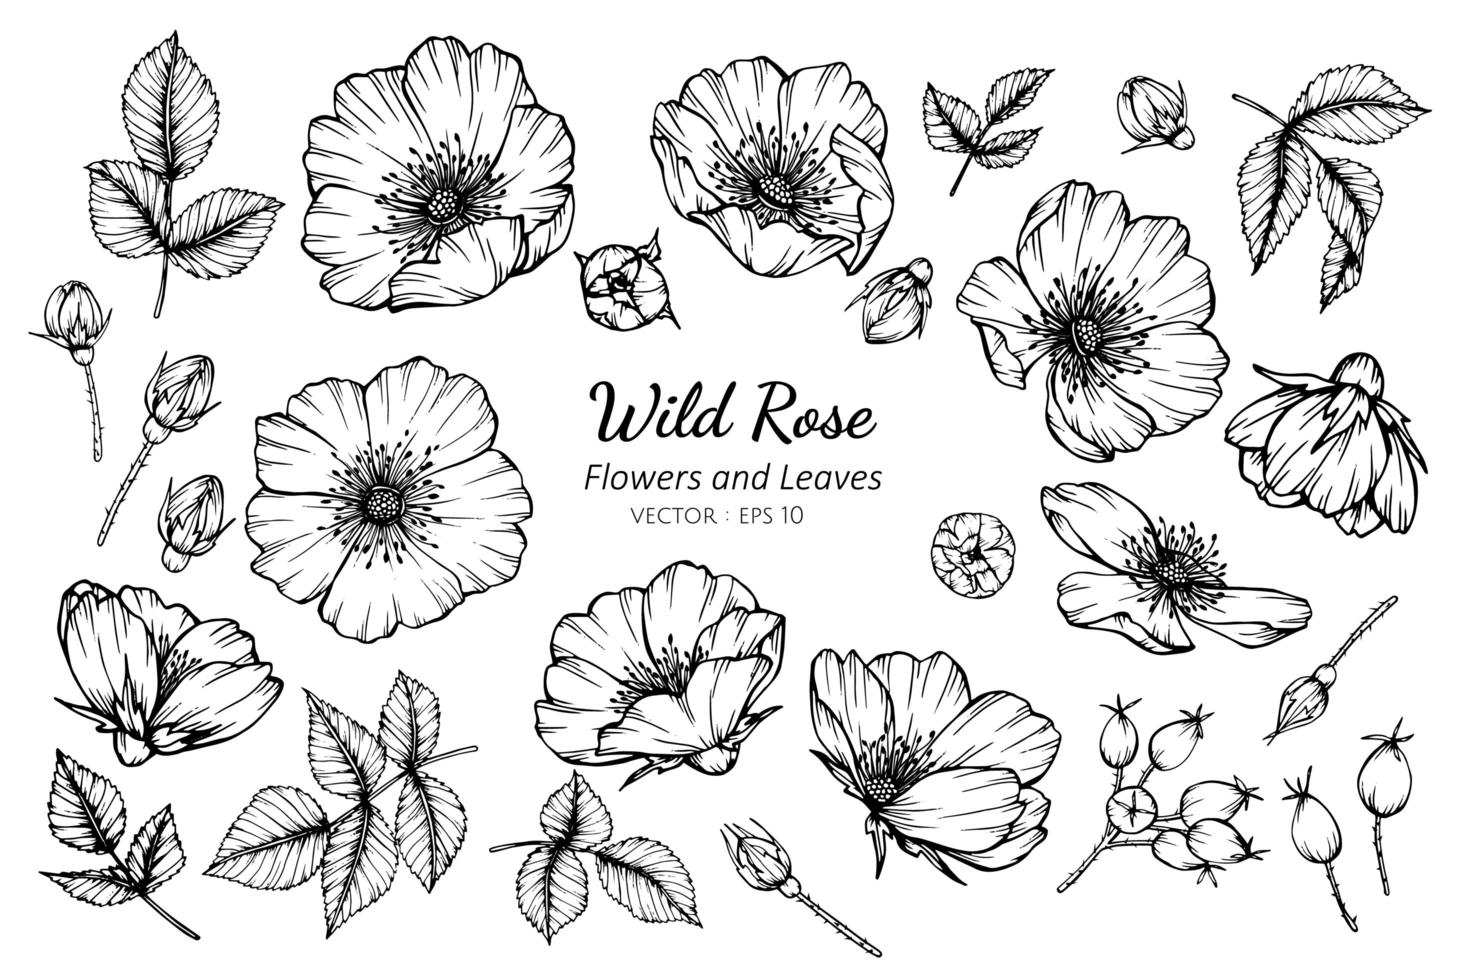 raccolta di rose e foglie selvatiche vettore